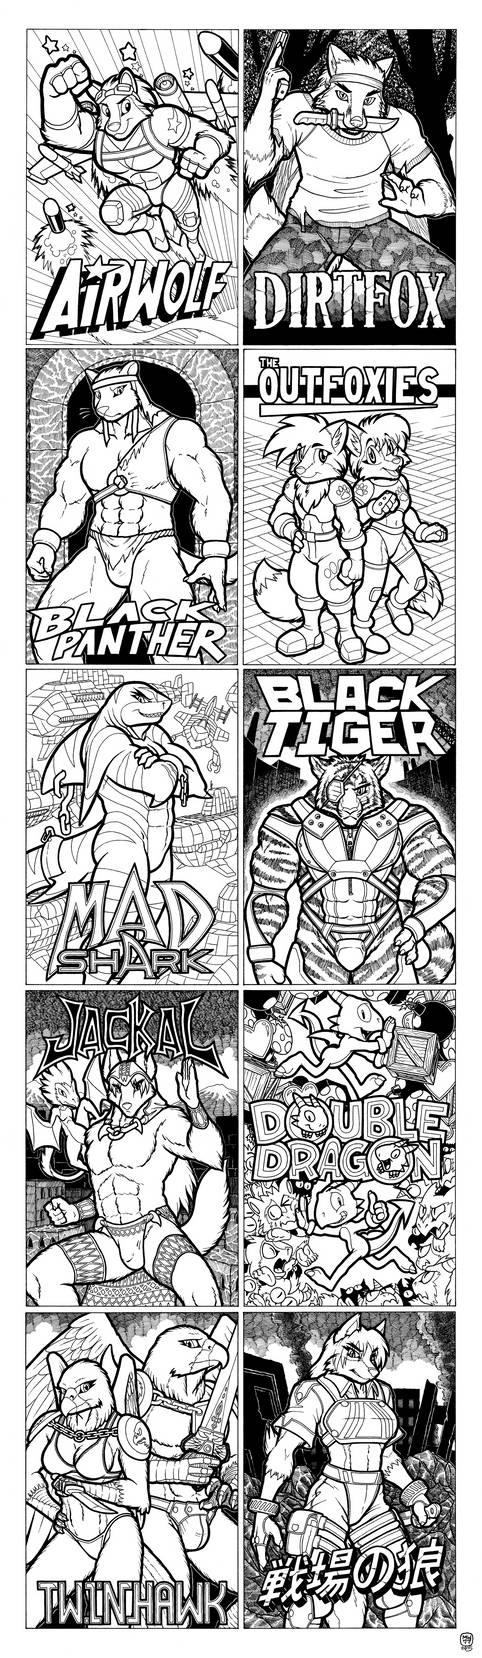 - Misinterpreted Classic Arcade Titles - by megawolf77